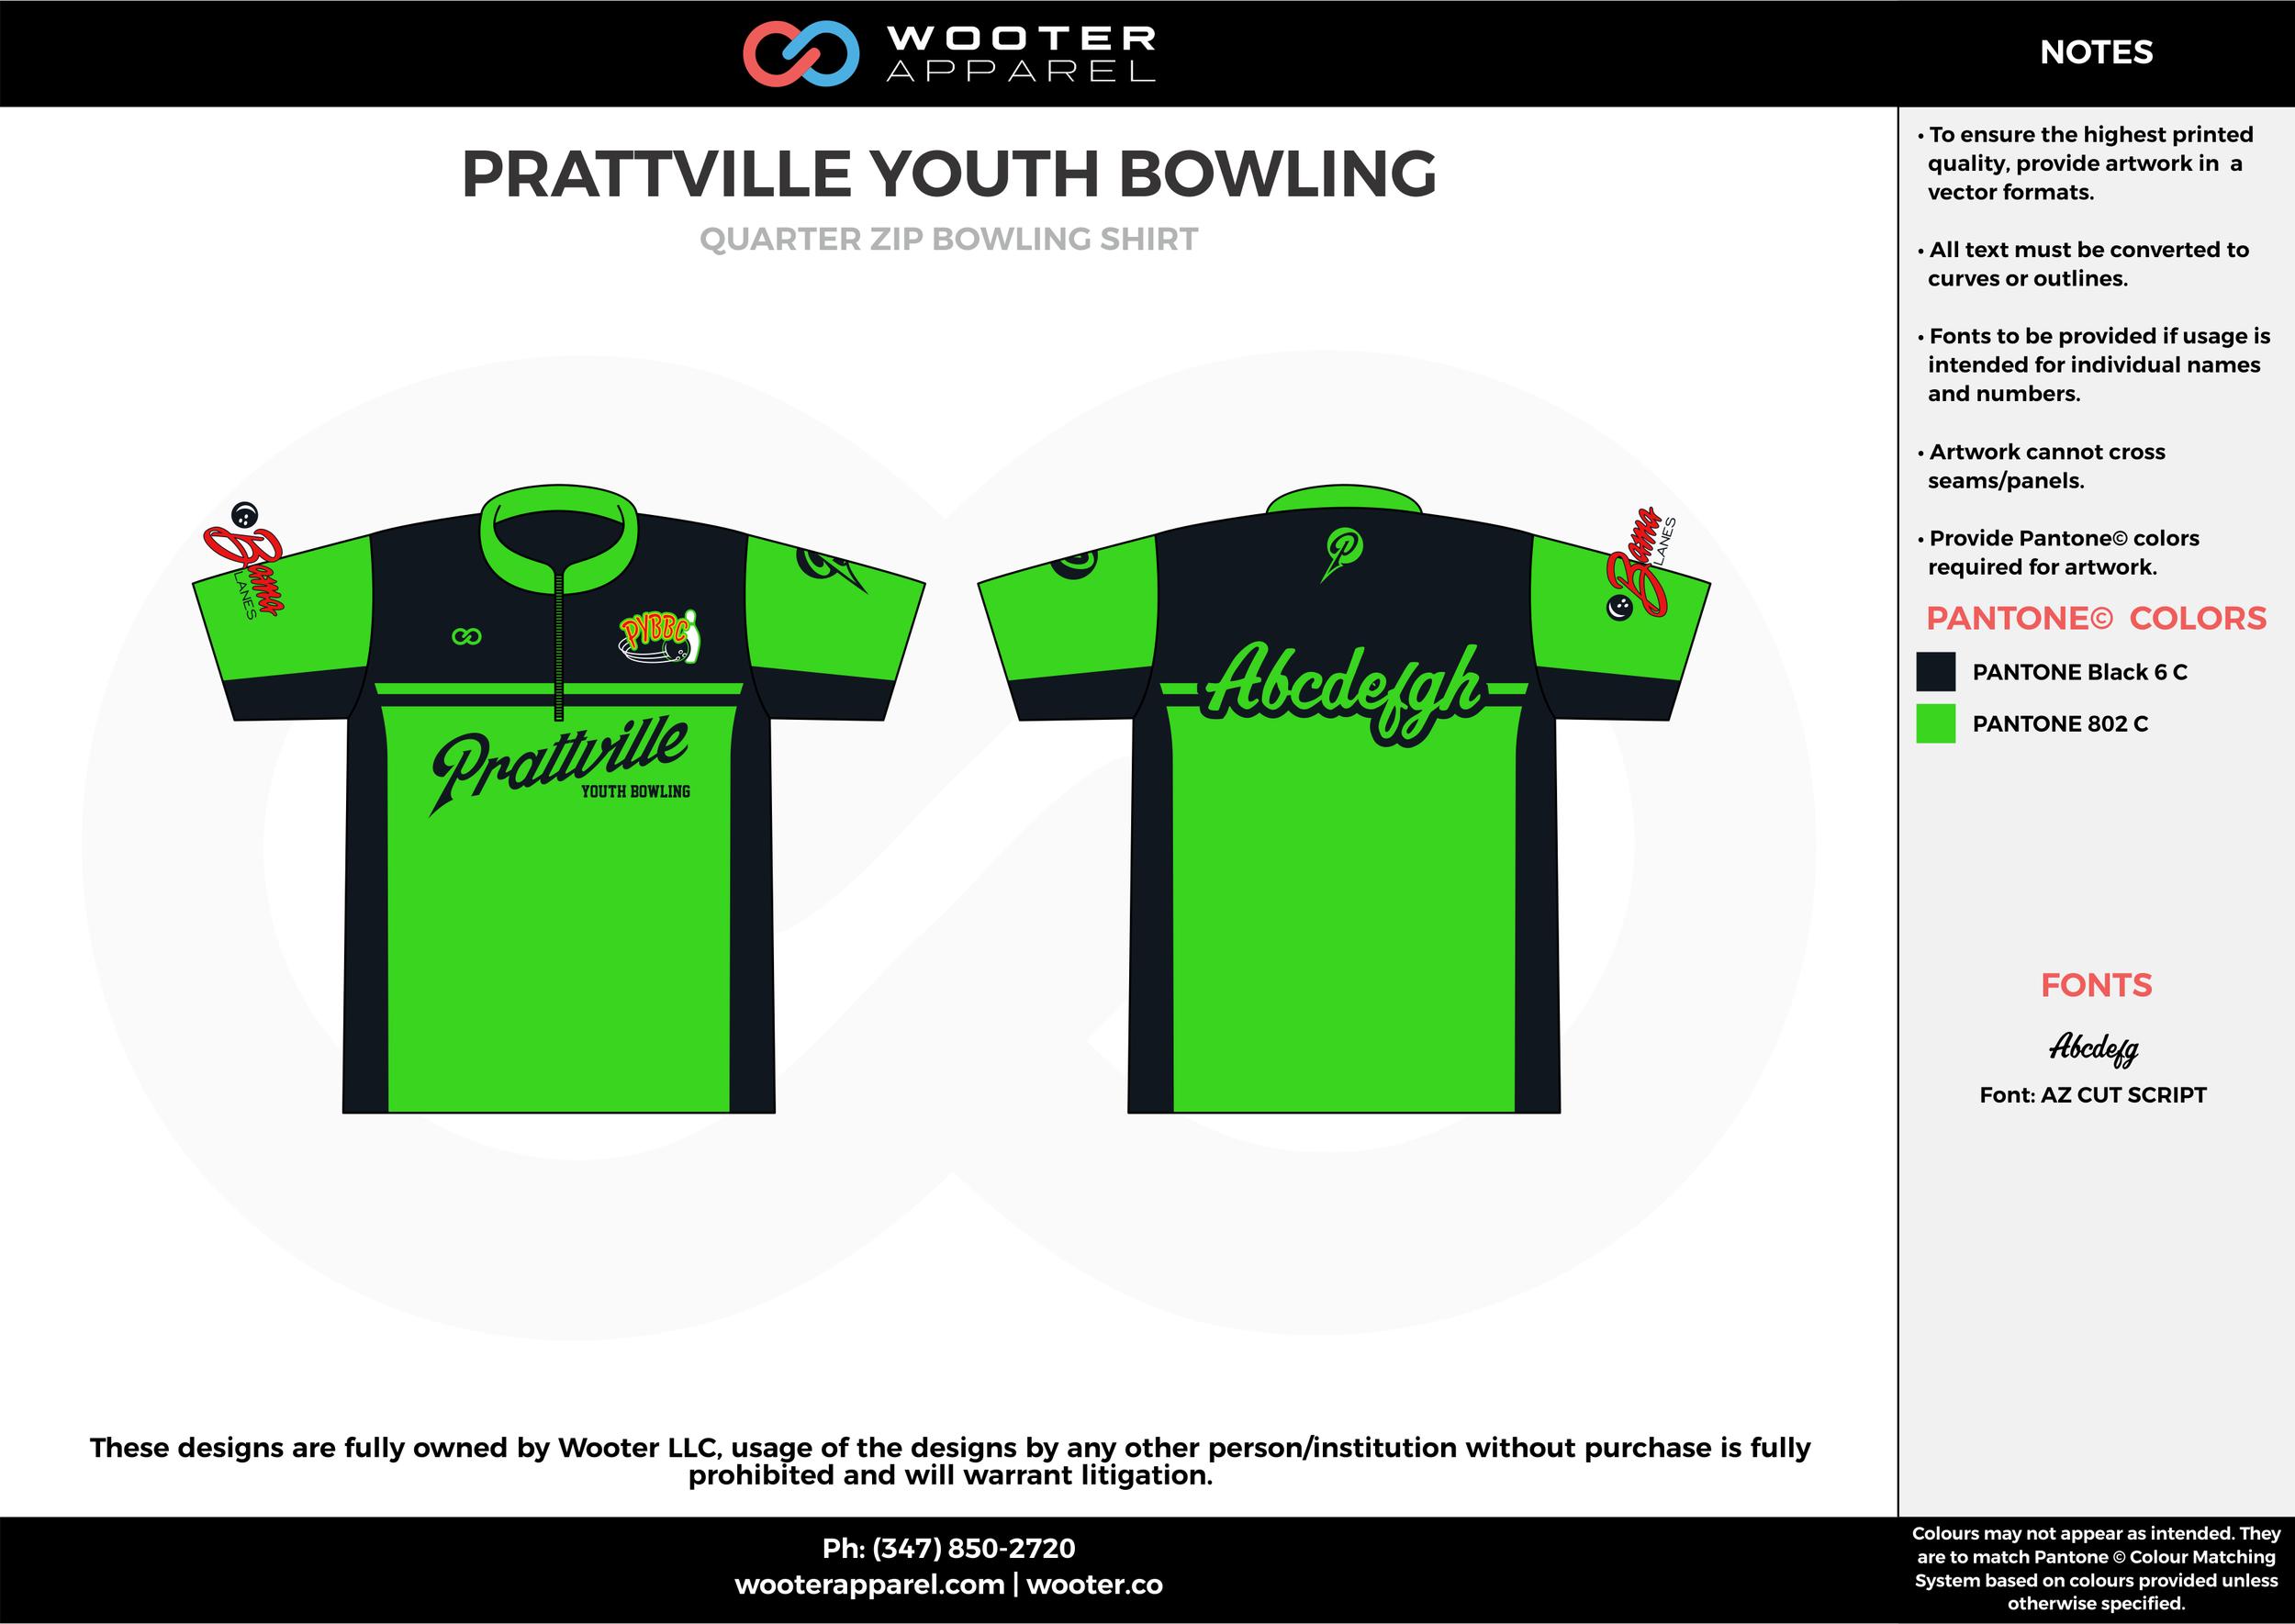 PRATTVILLE YOUTH green black bowling uniforms, shirts, quarter zip polo